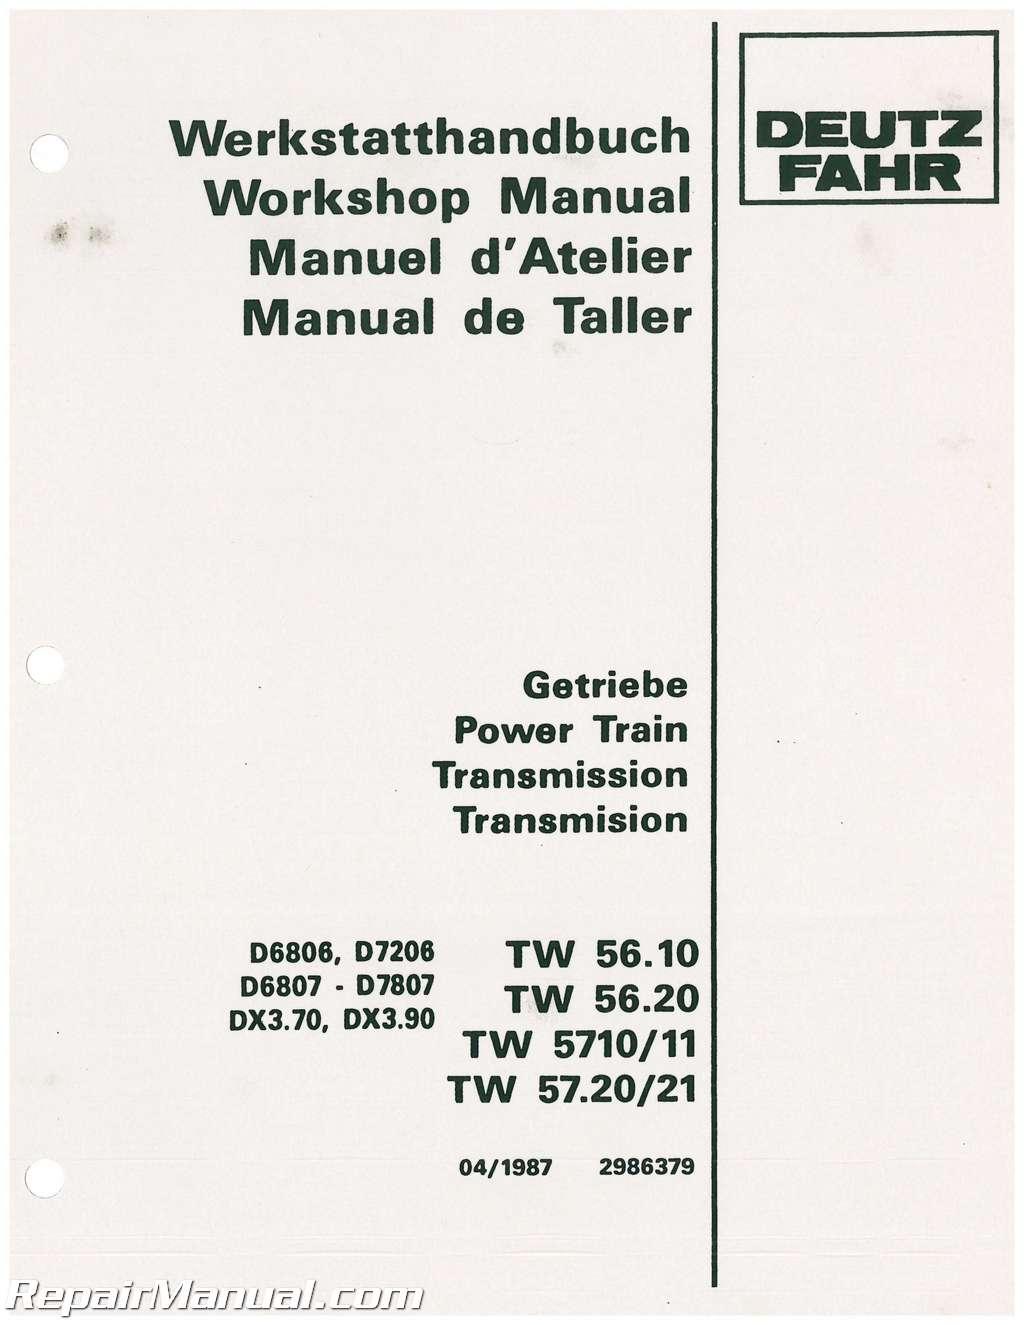 Deutz allis 7120 Service Manual